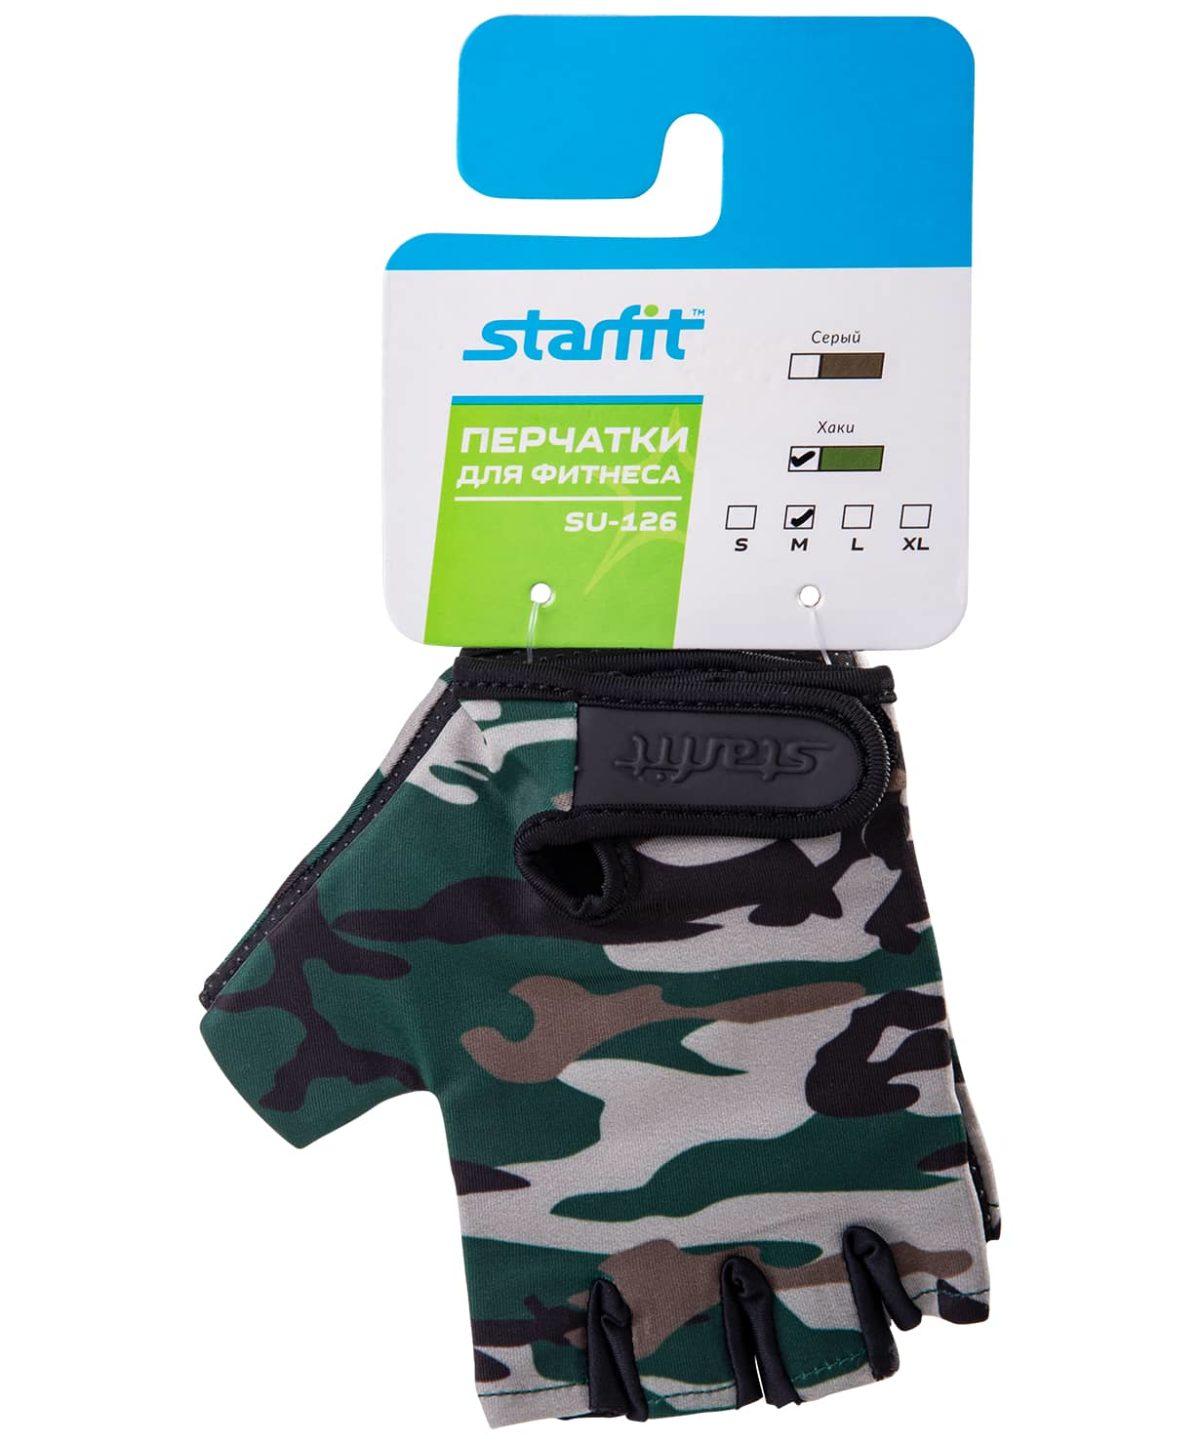 STARFIT перчатки д/фитнеса  SU-126: хаки - 2